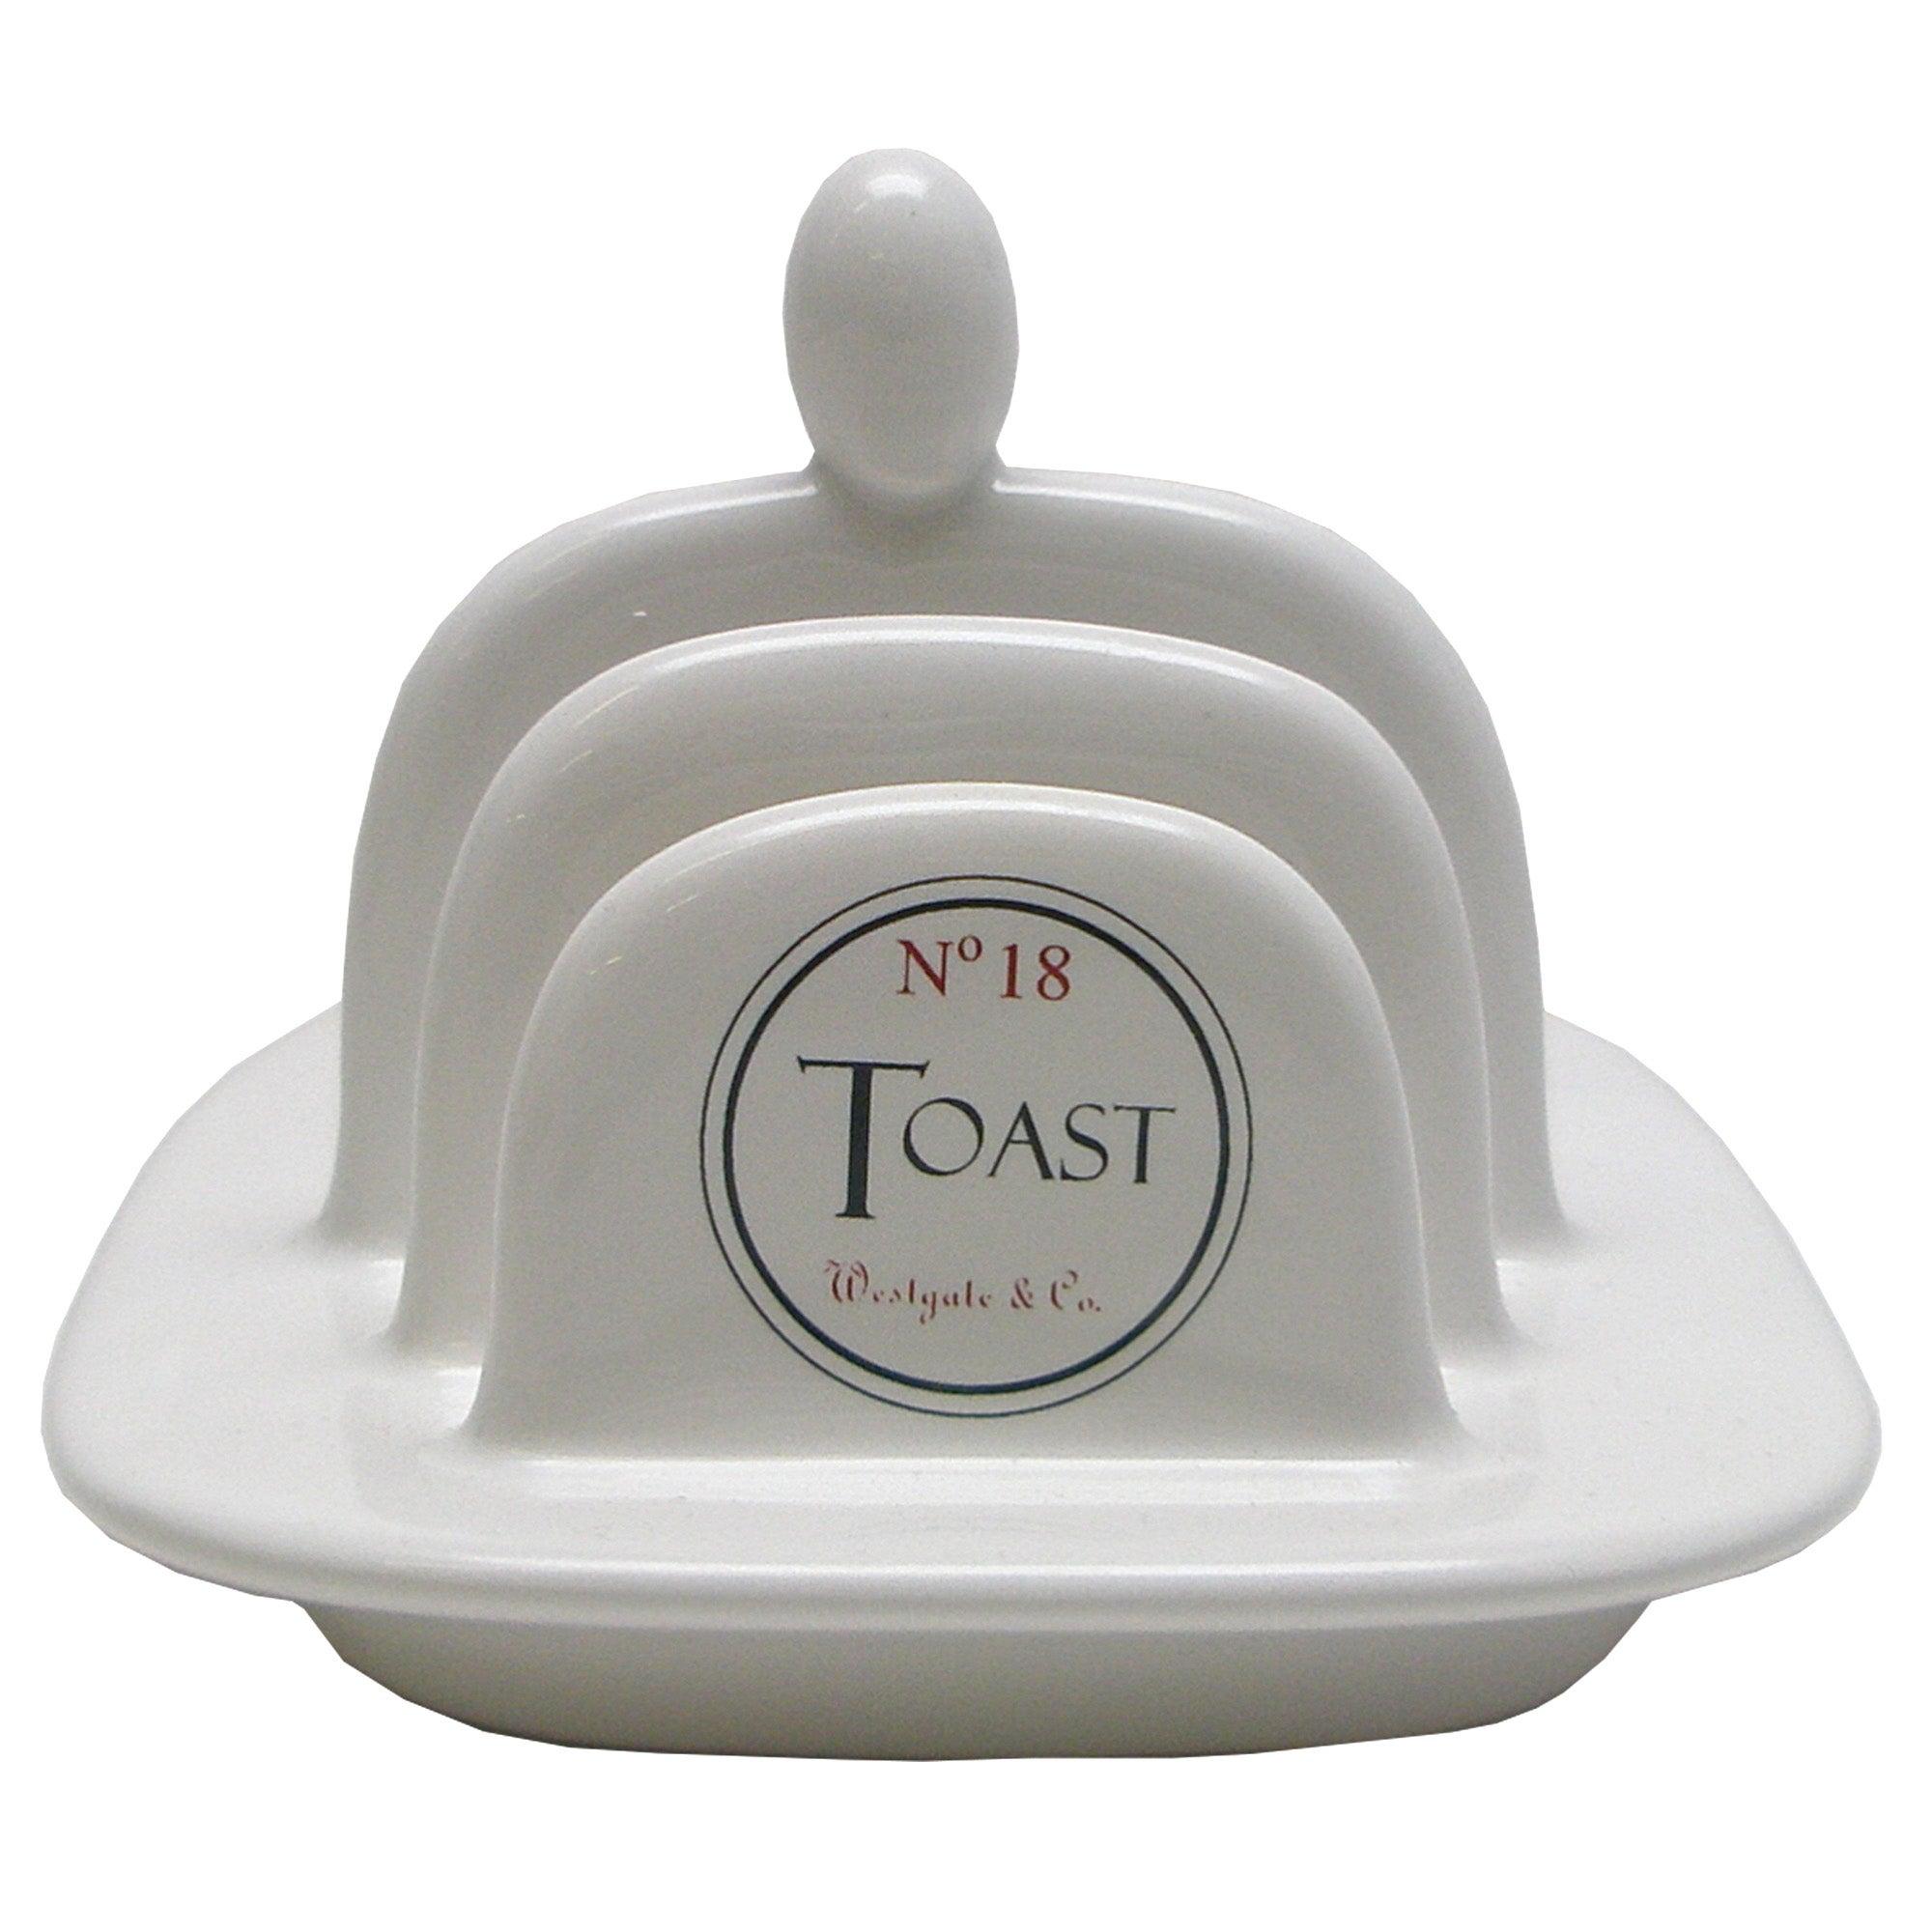 Vintage Tea Dinnerware Collection